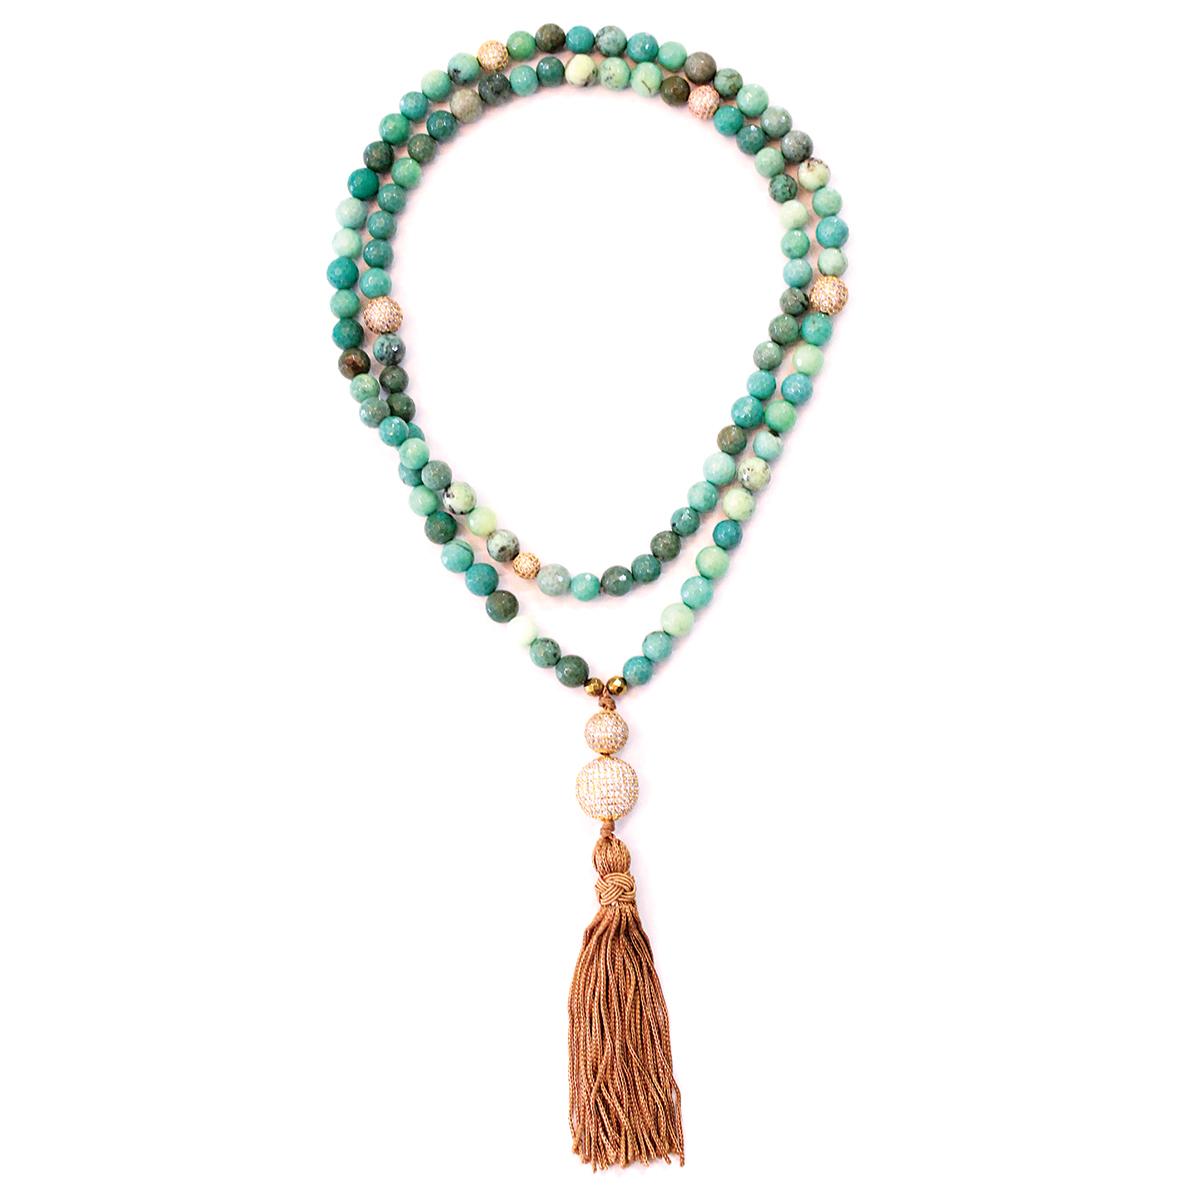 sisco berluti marrakesh necklace fringe